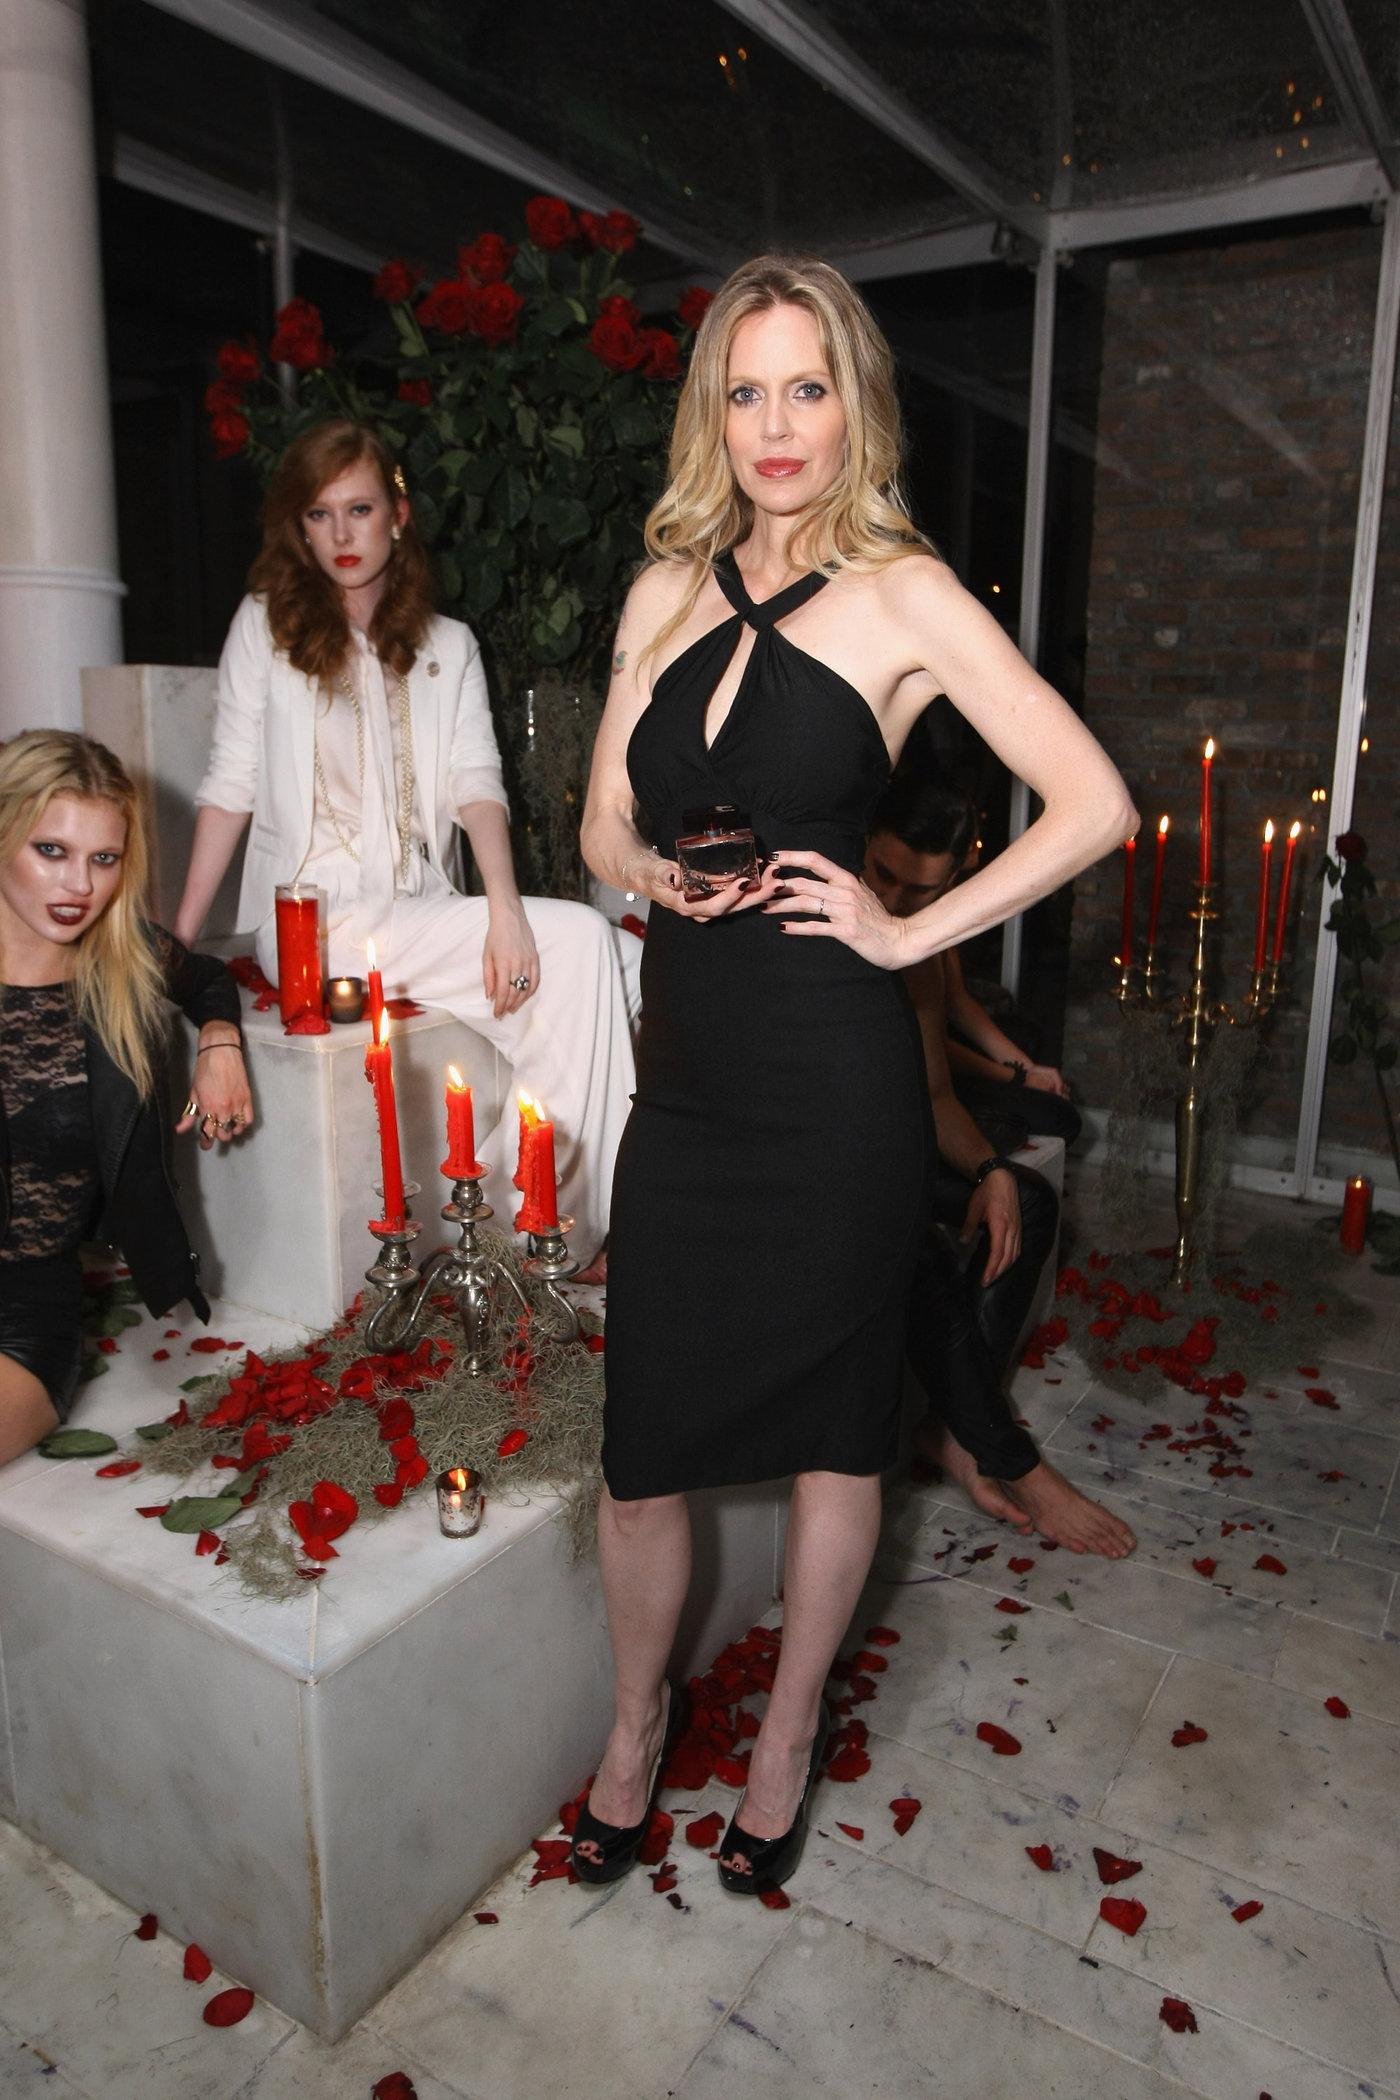 Kristin Bauer - HSN & HBO Launch Forsaken Inspired By True Blood in New York City (July 26, 2012)